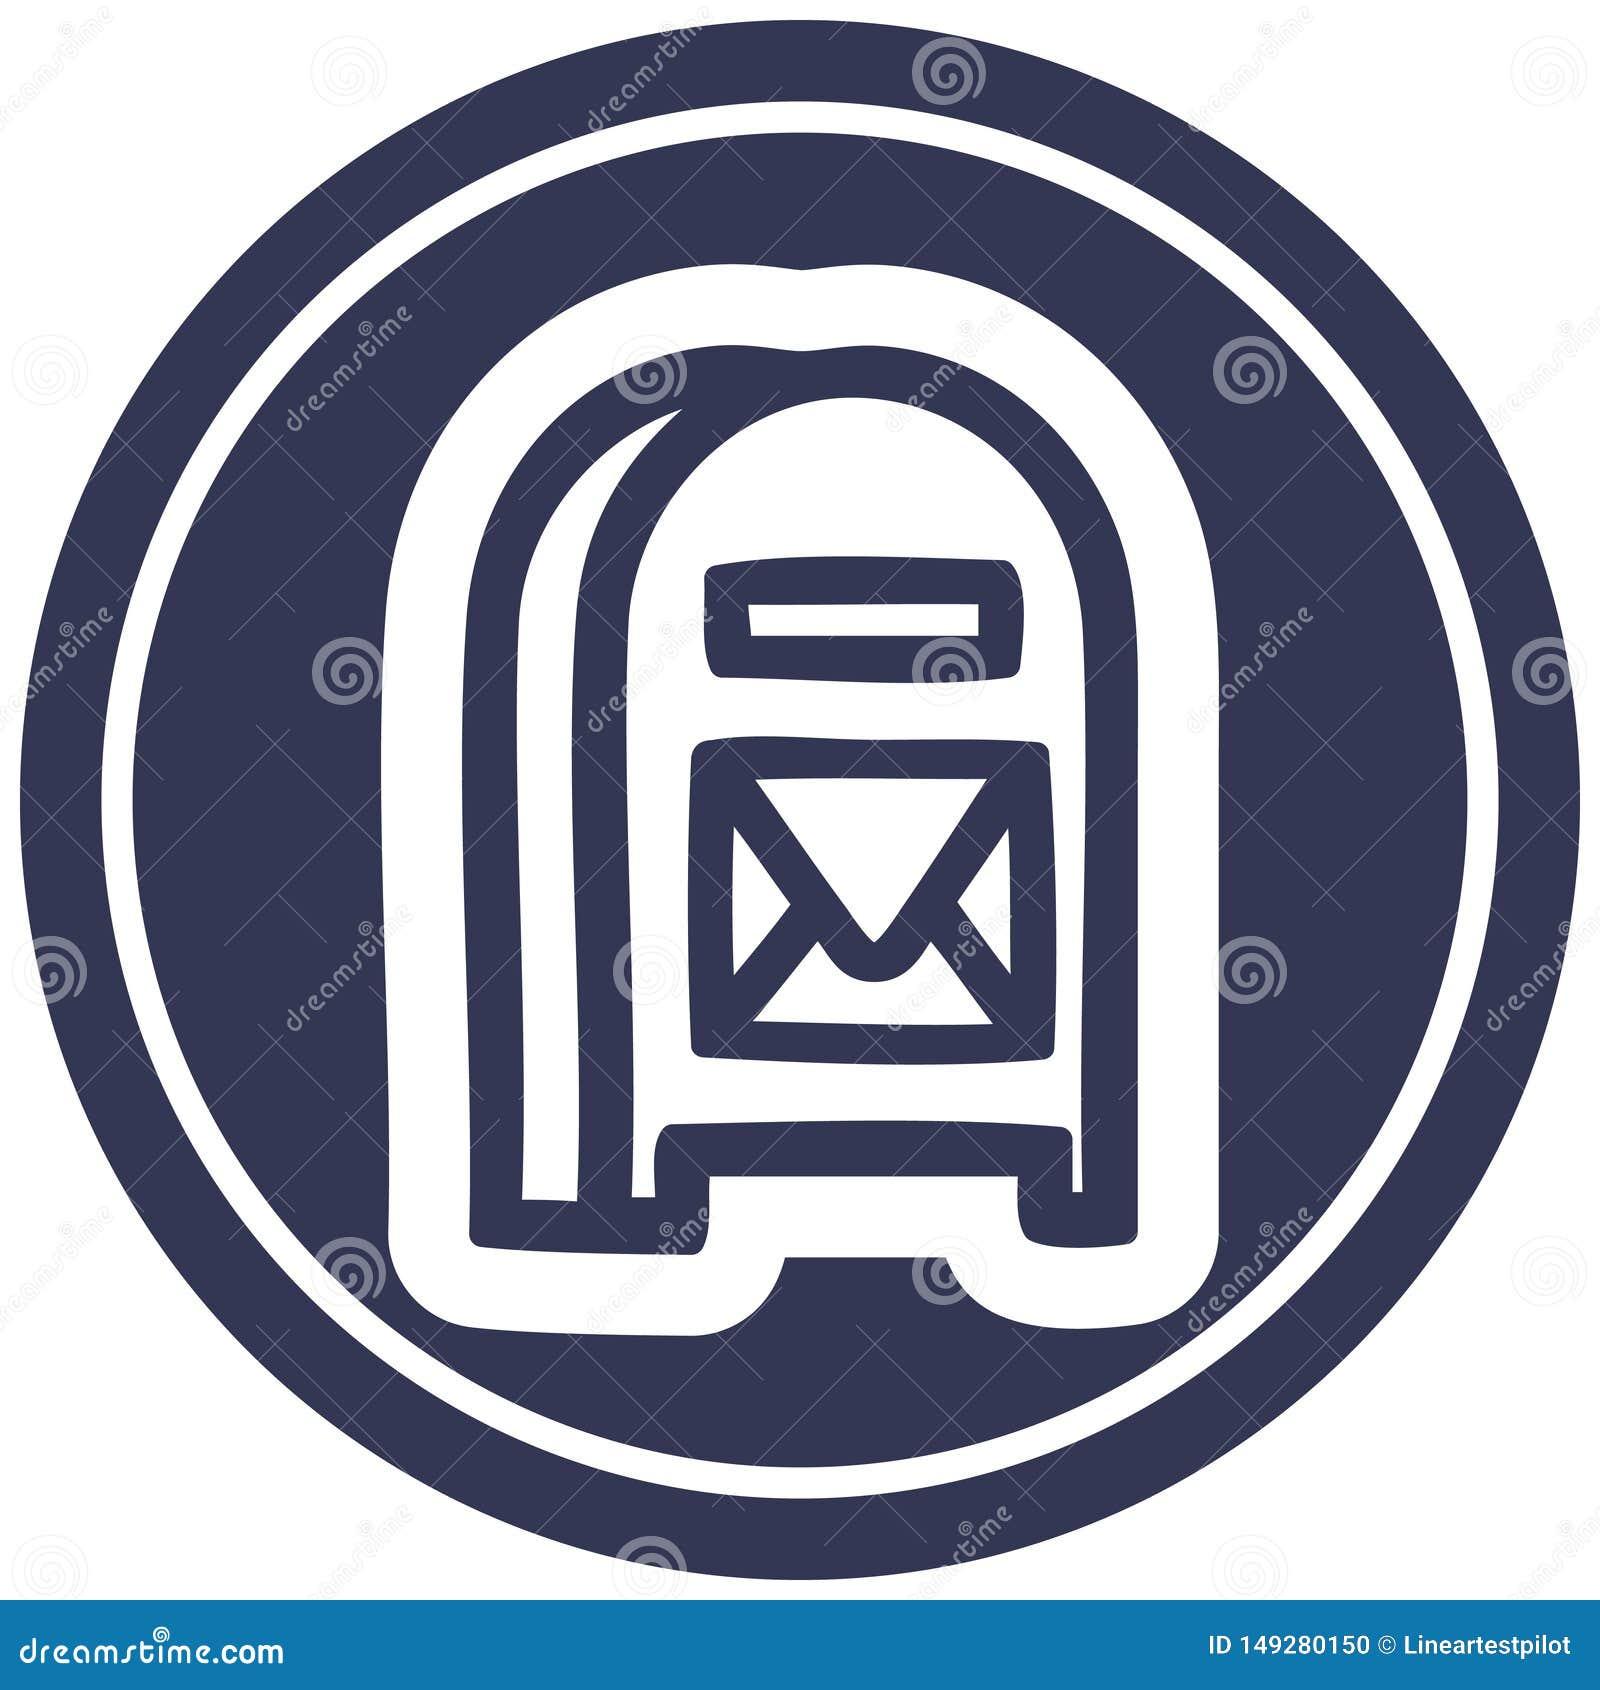 mail box circular icon